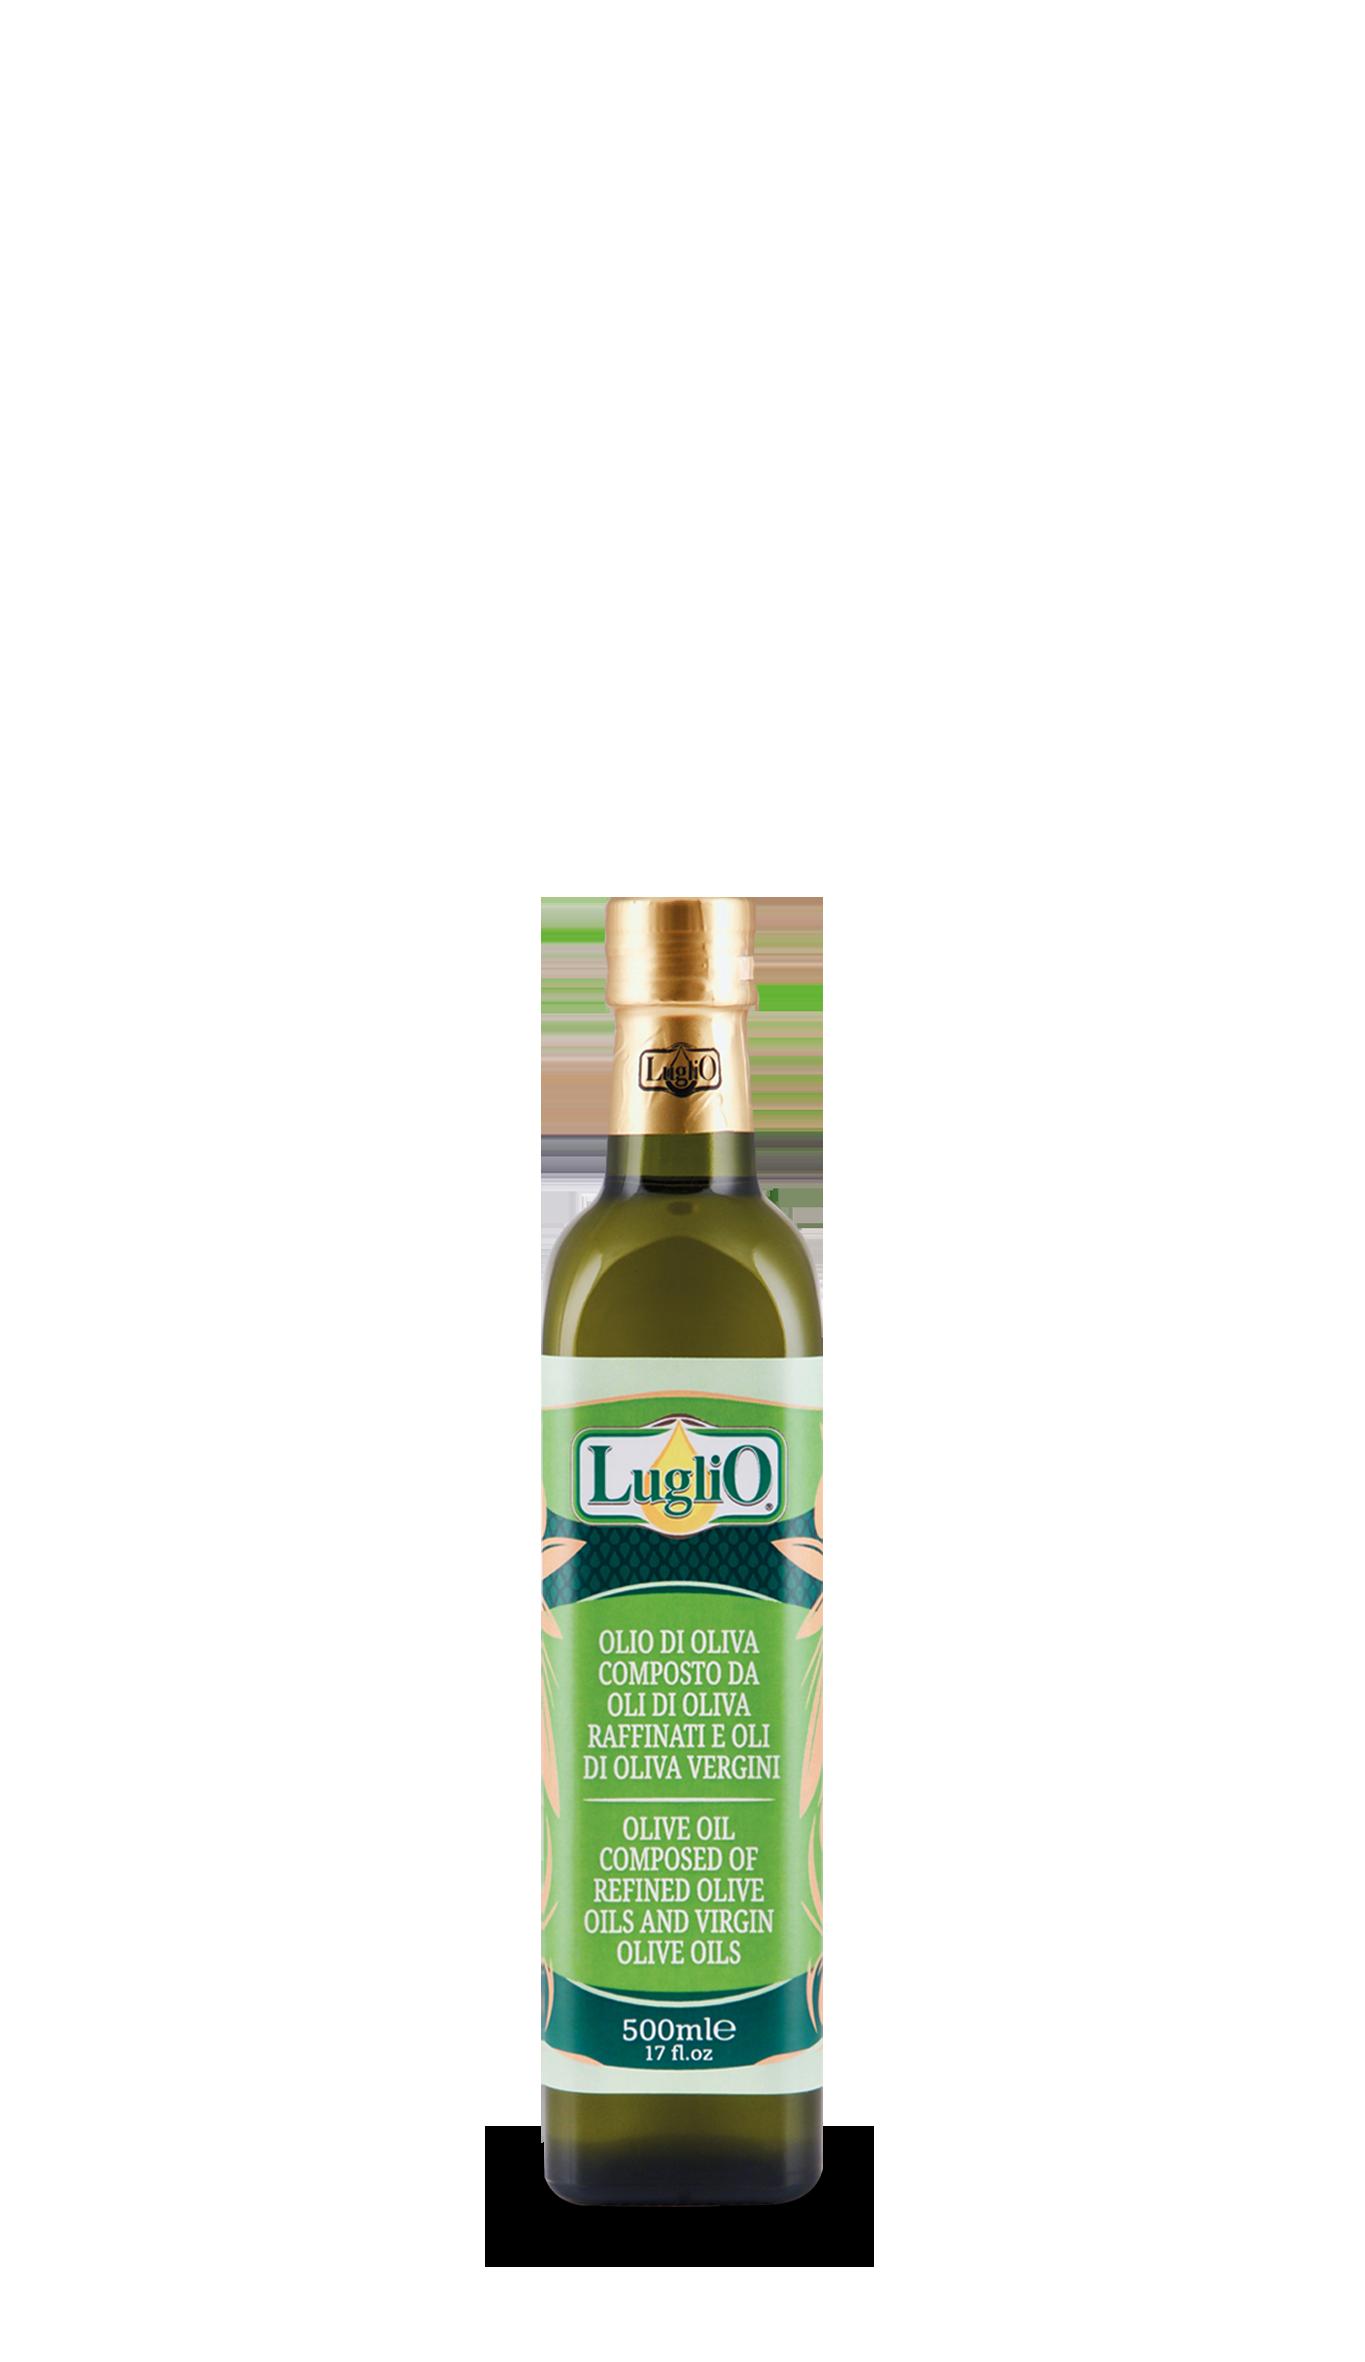 Olio Luglio olio d'oliva 500ml in bottiglia di vetro